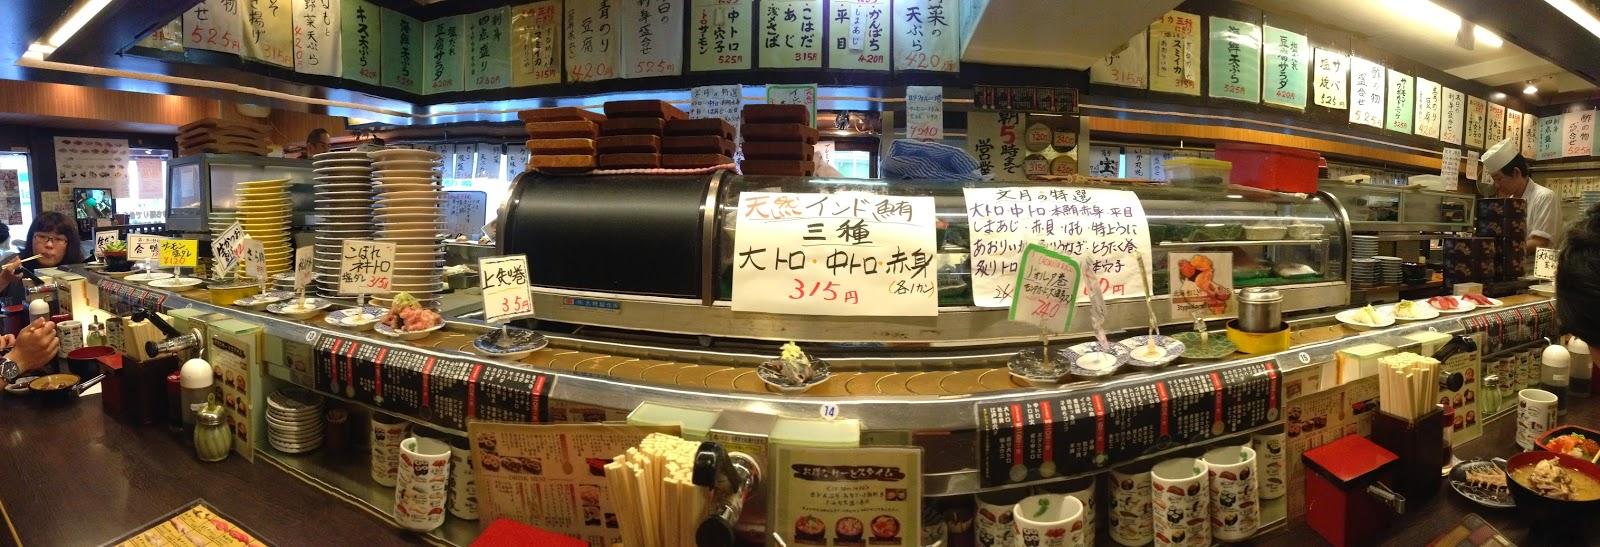 Sushi - Zemlja porekla. Geneza. Vrste. Moderan sushi.